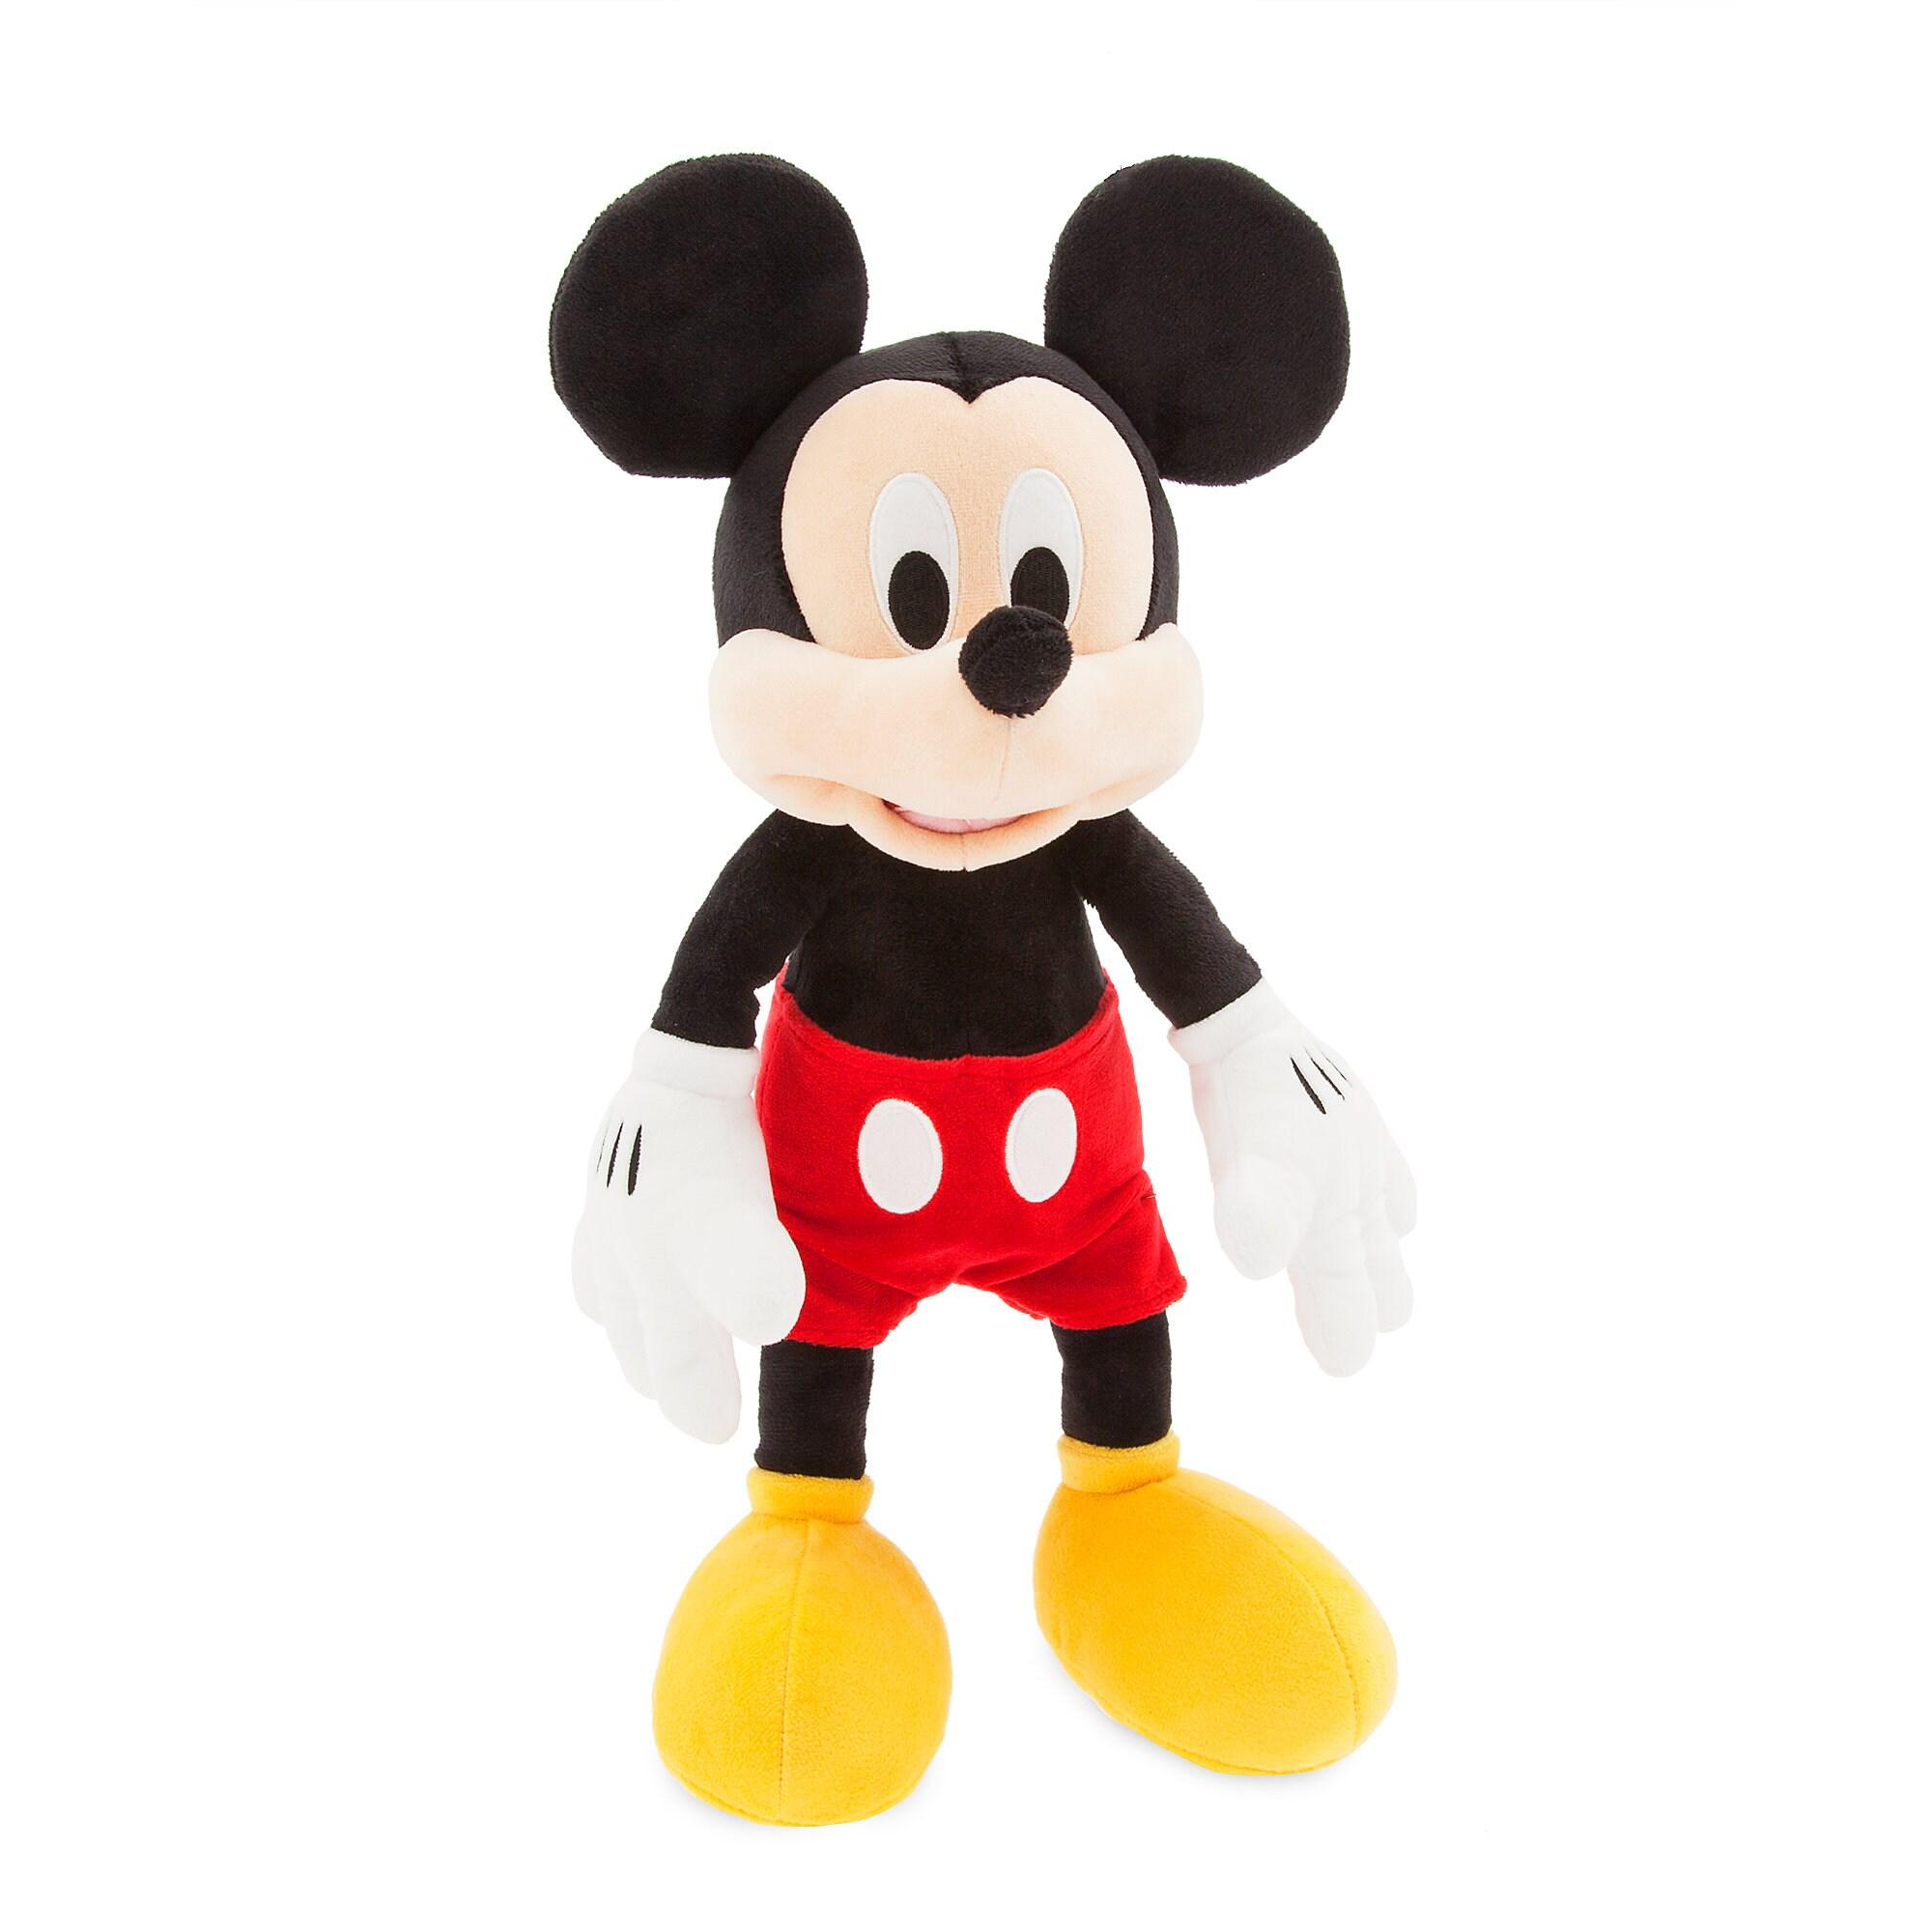 Original Mickey Mouse Club Home